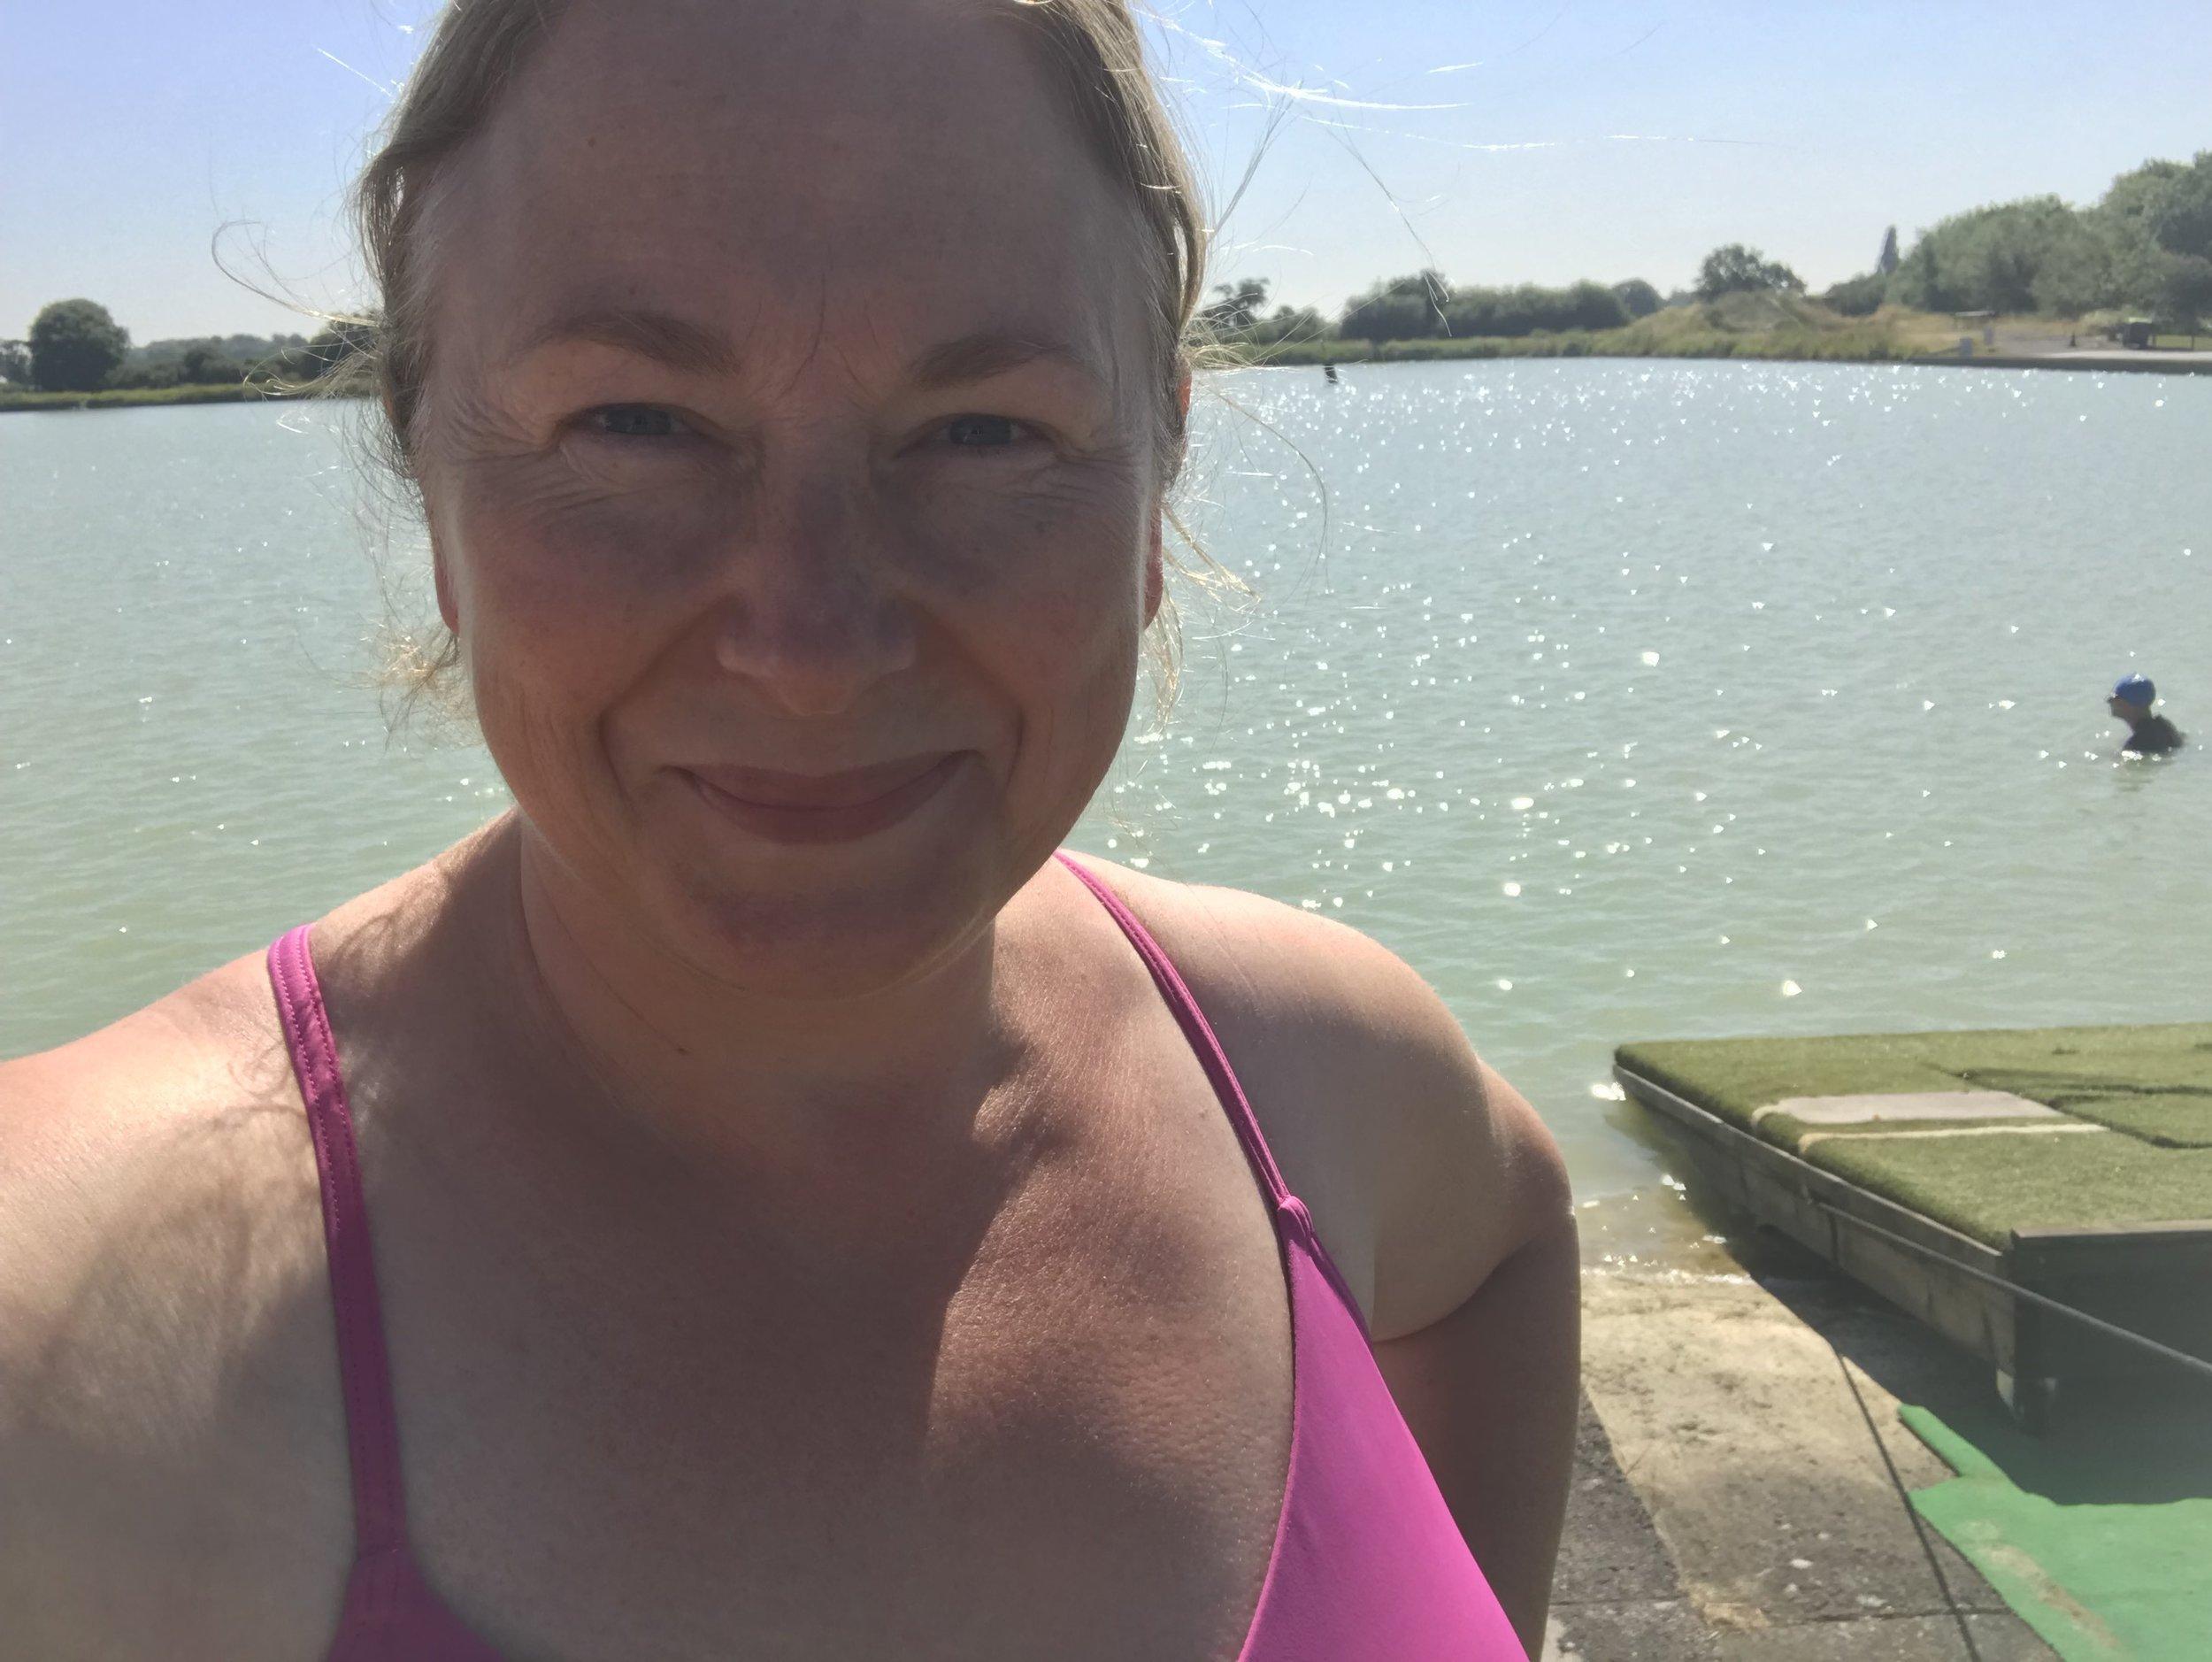 Before the swim